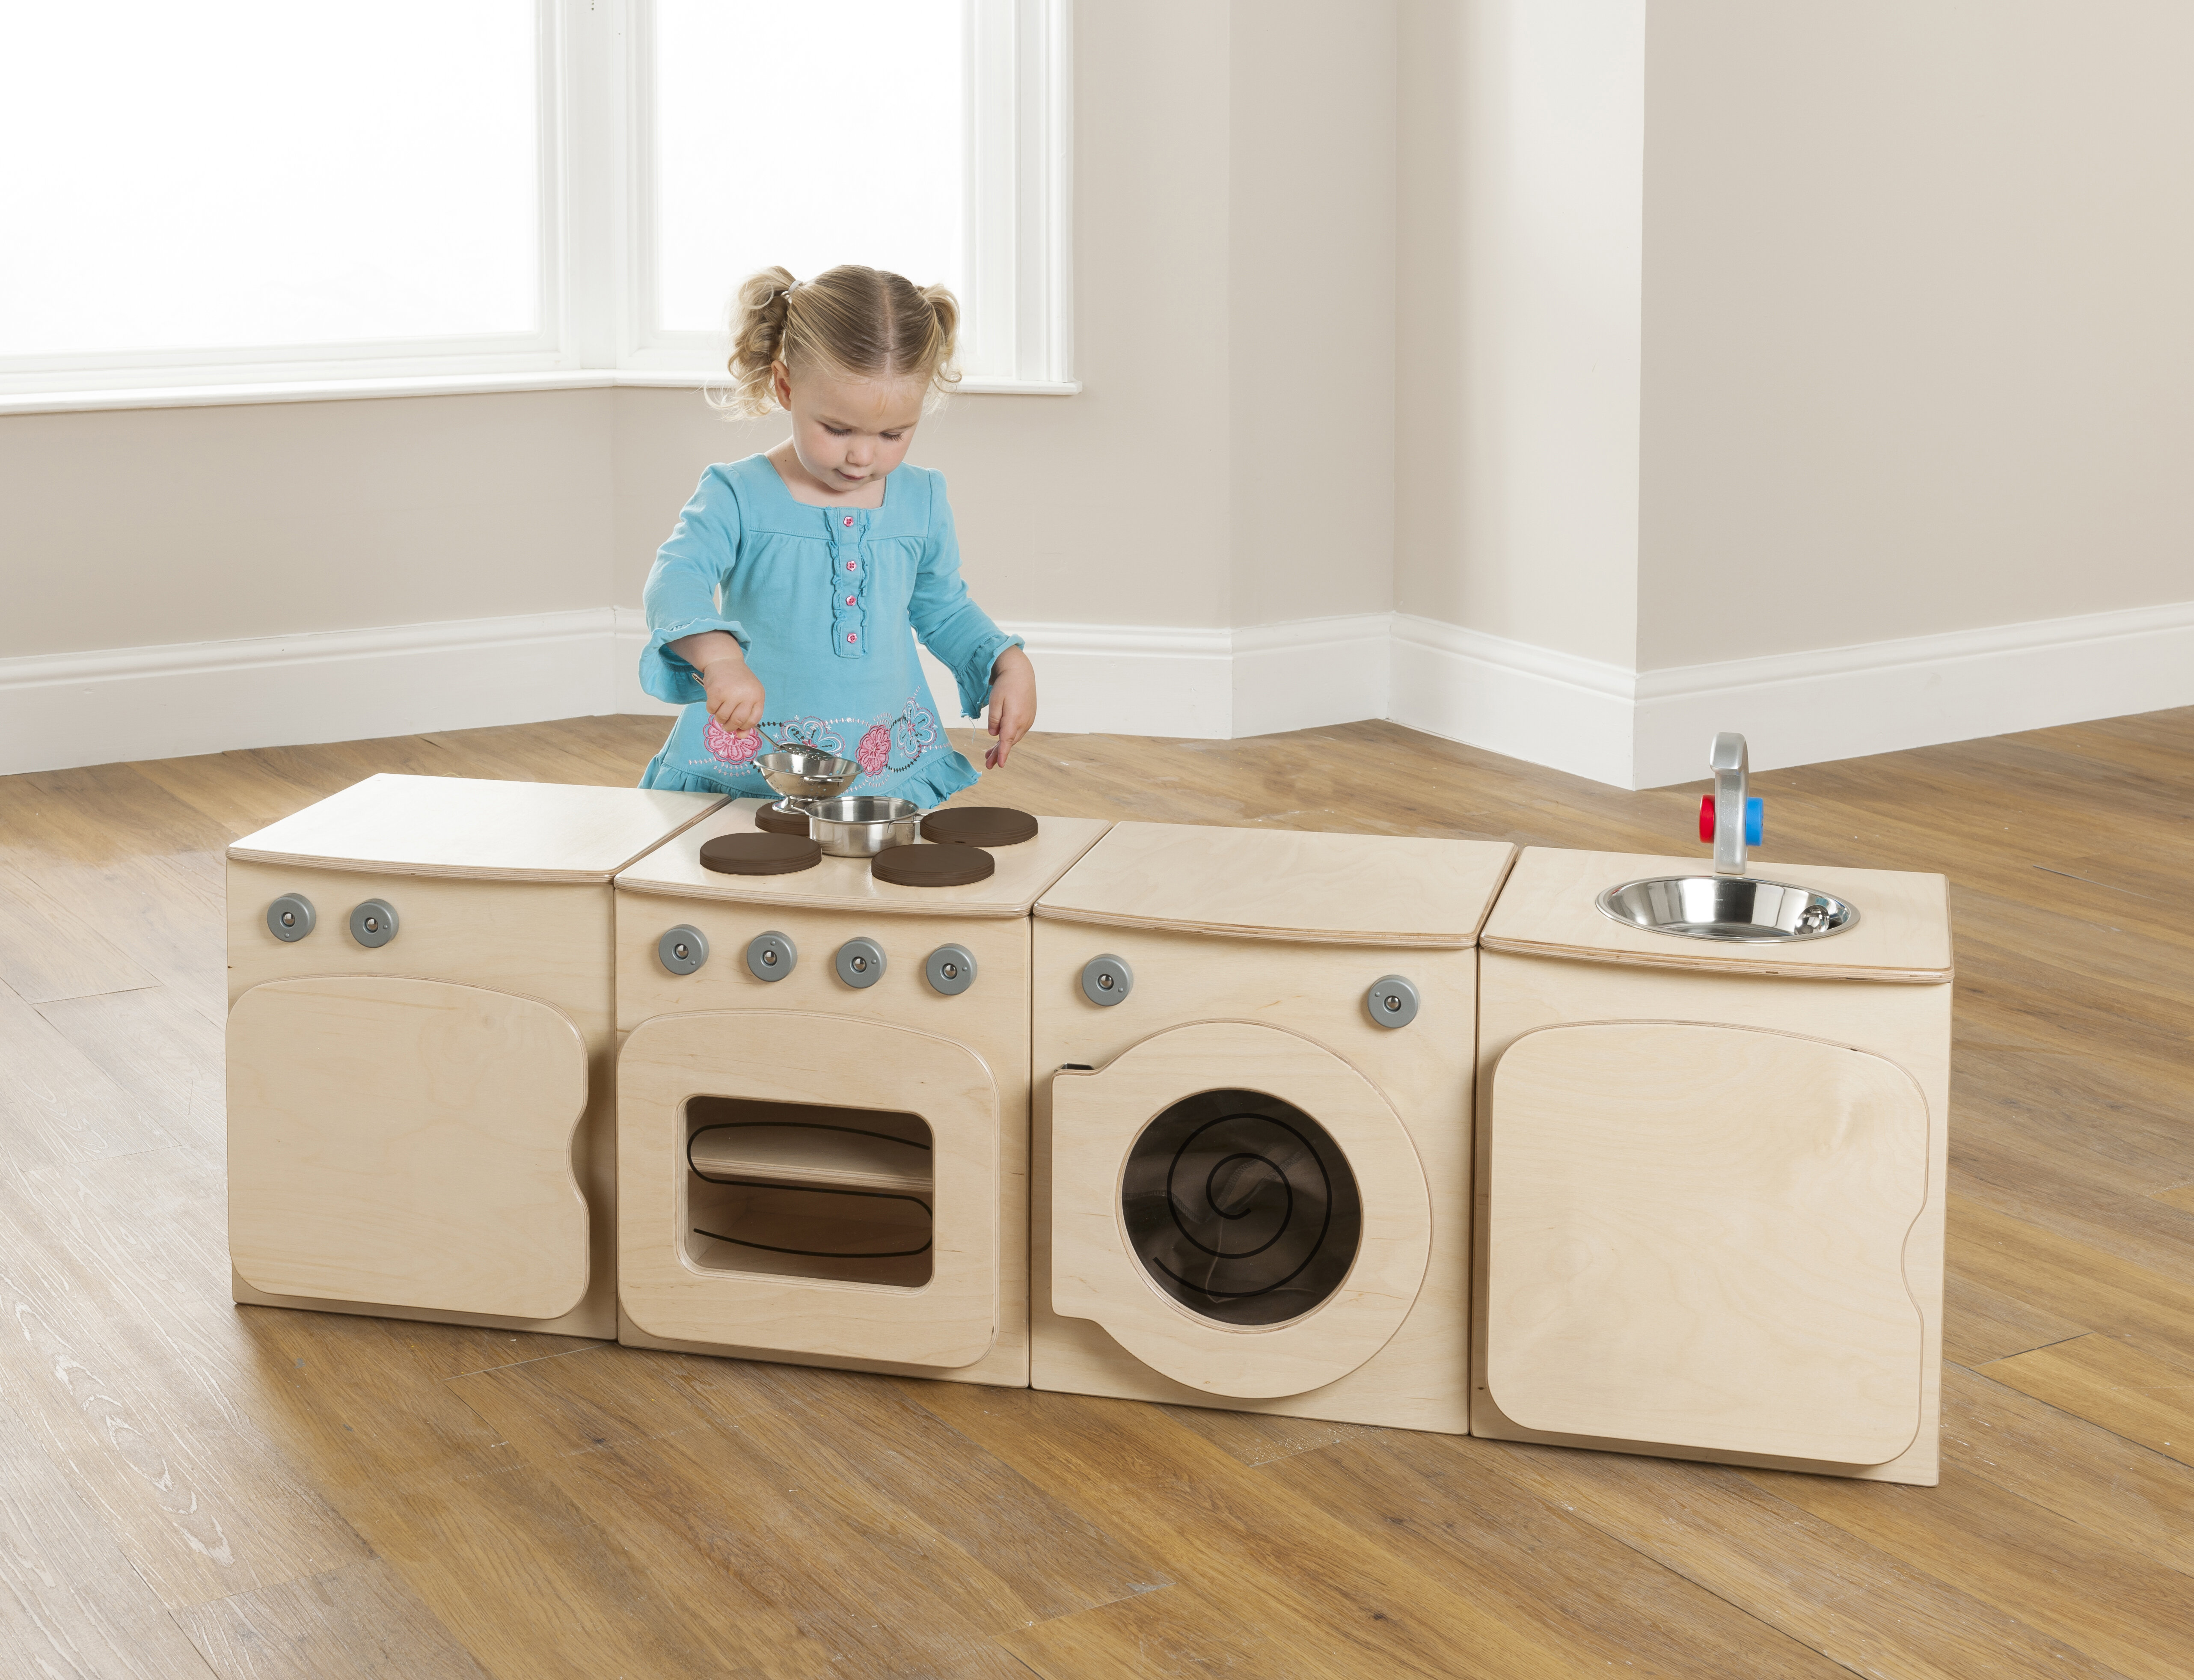 Millhouse 4 piece toddler kitchen set wayfair co uk